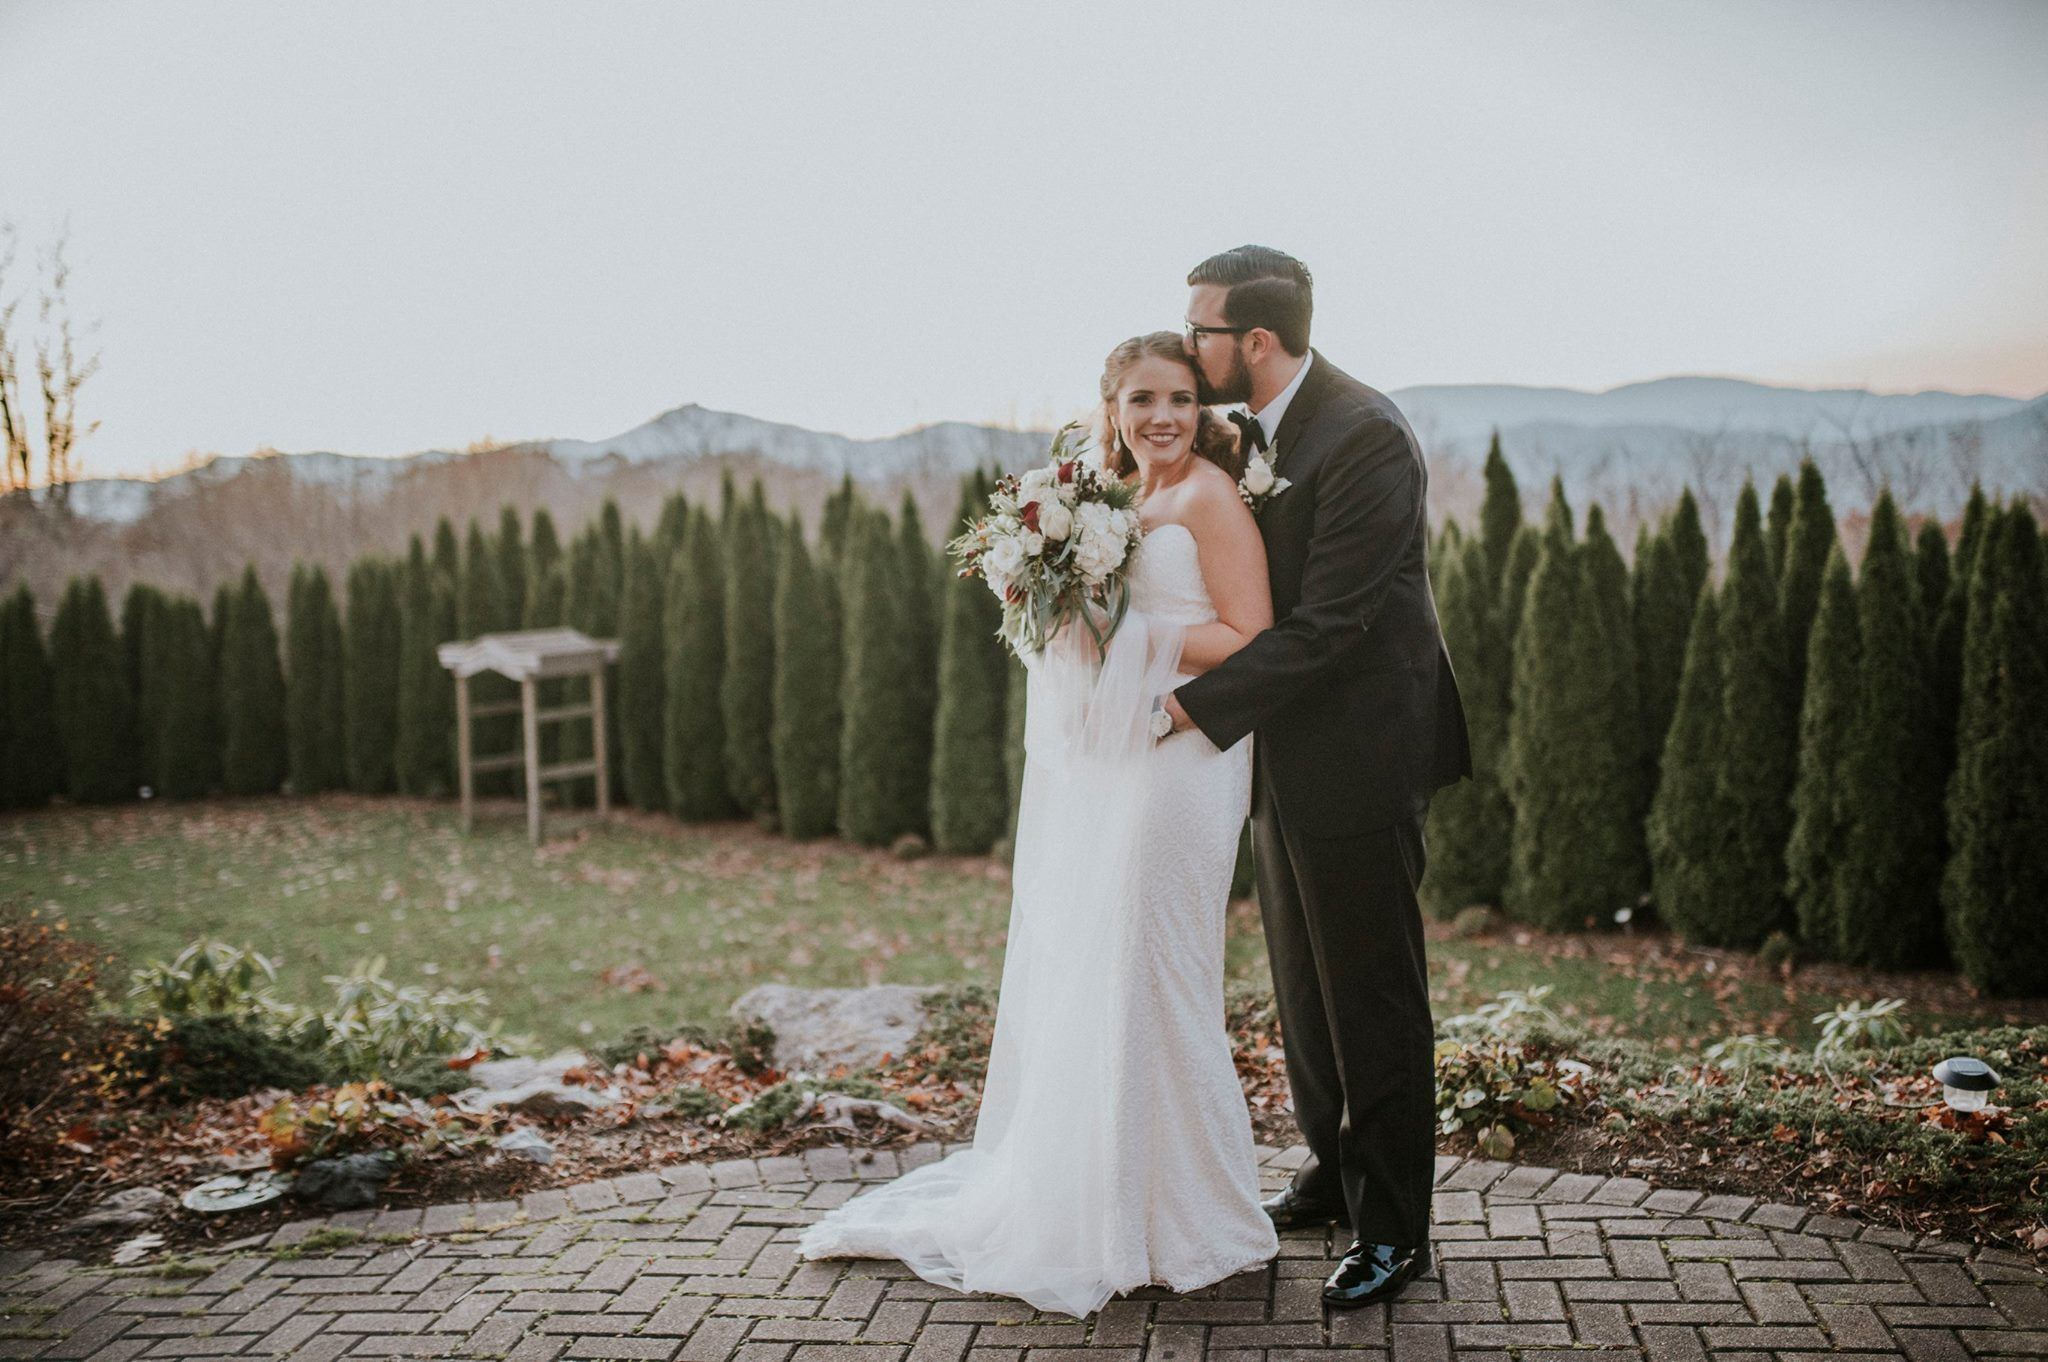 Pin By The Pros Weddings On The Pros Real Weddings North Carolina Mountain Wedding Photos Wedding Photoshoot Wedding Photos